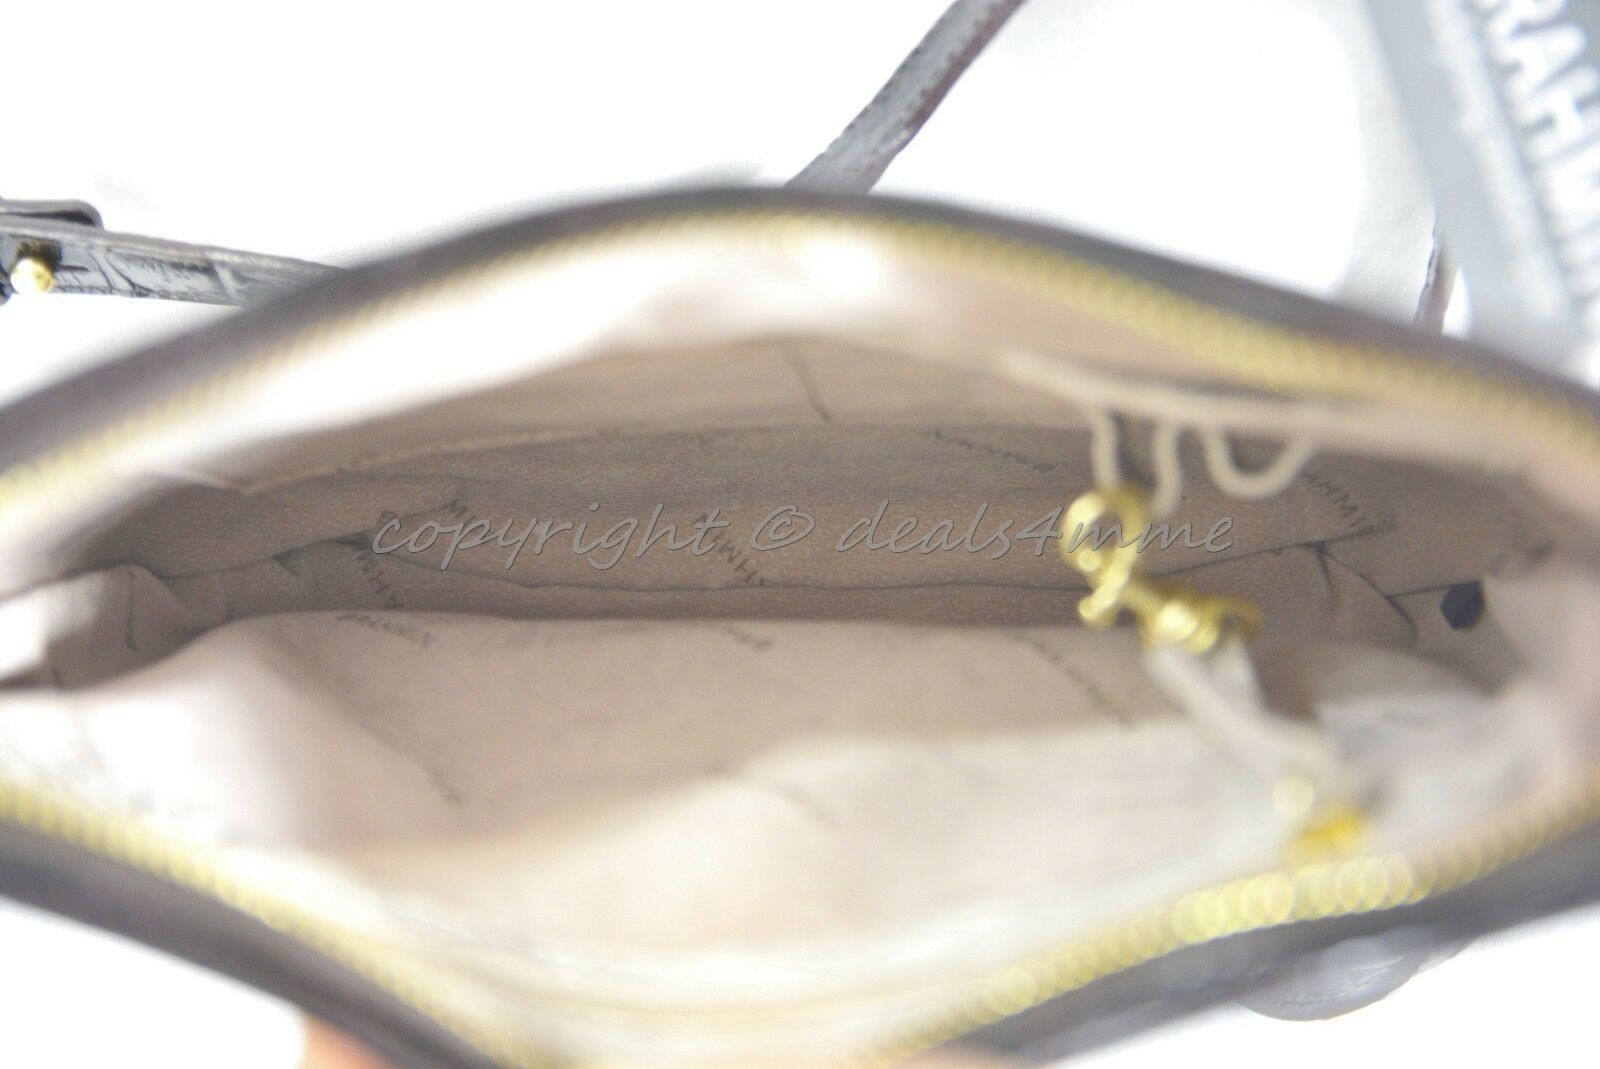 NWT Brahmin Jody Striped Cross-Body/Shoulder Bag in Angora Vineyard image 9